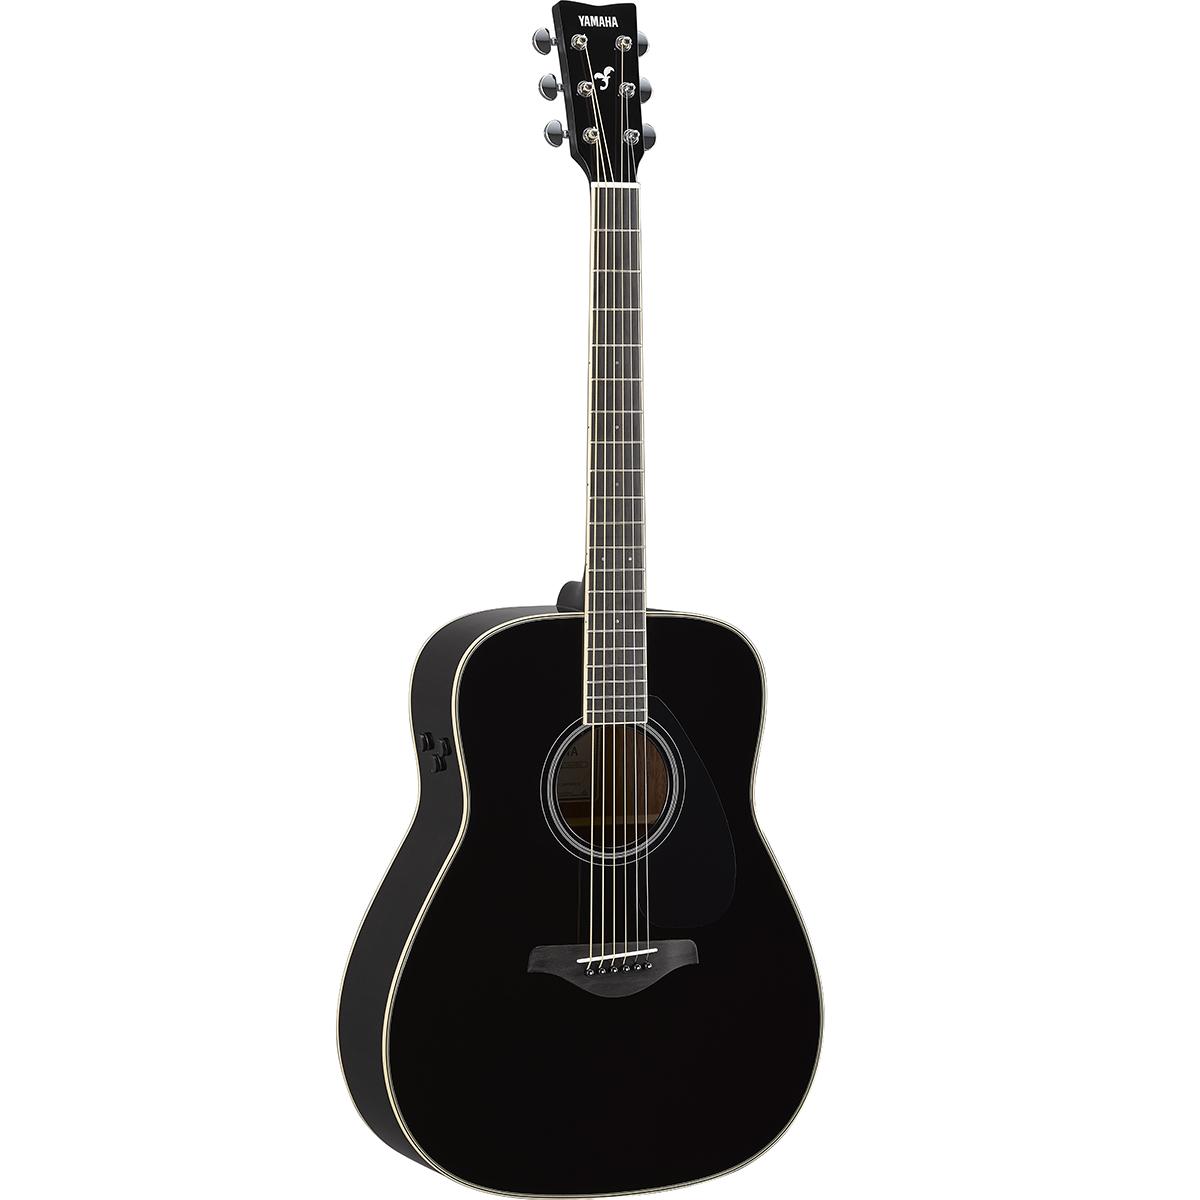 Yamaha - Guitare TransAcoustic FG-TA - Noir